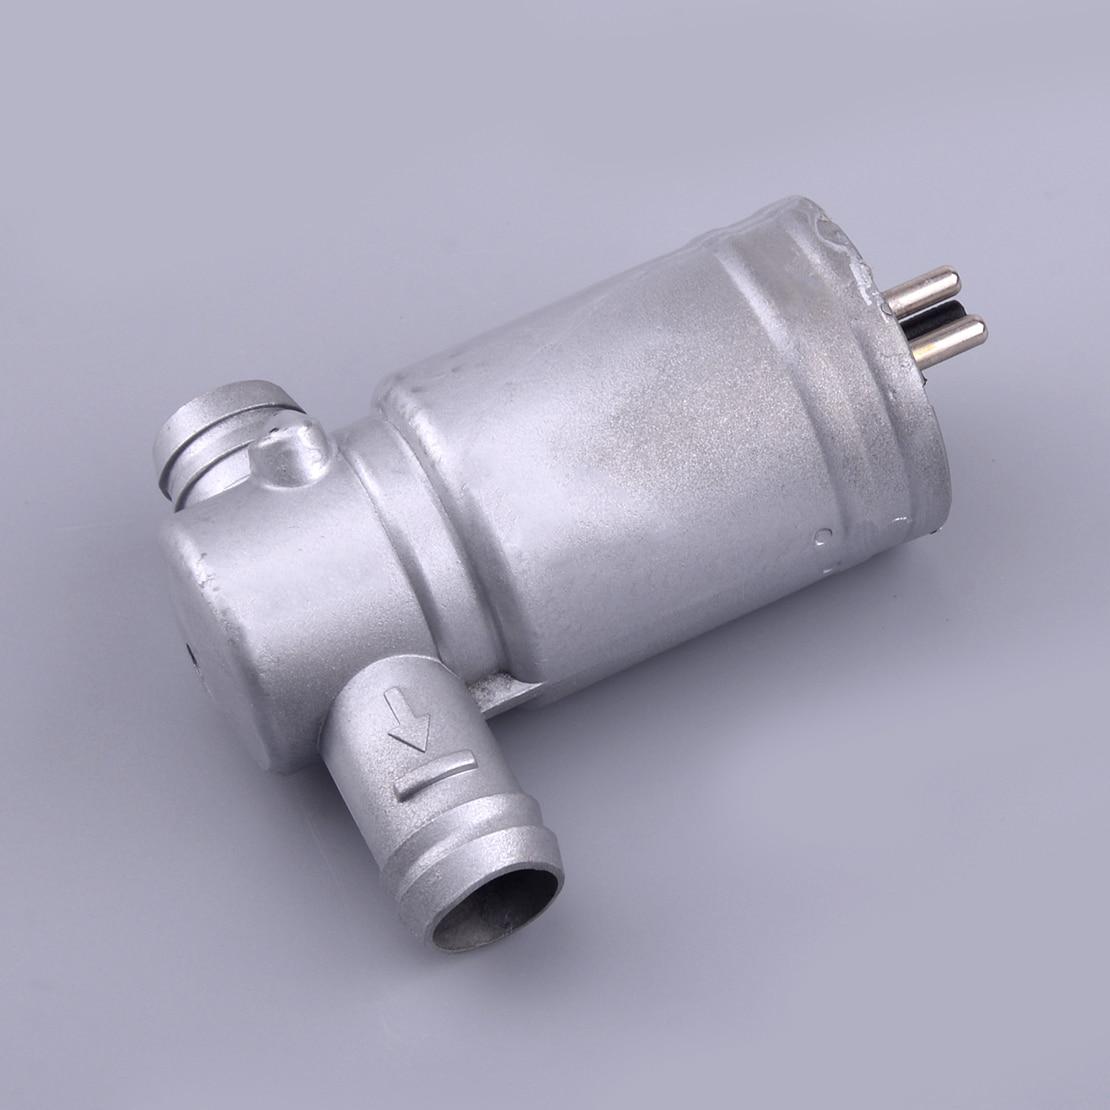 Coche Válvula de Control de aire de 0280140510, 0001412225, 46127238, 1412225, 0280140510 Adecuado para Mercedes W124 W126 W201 190E 300E 300CE